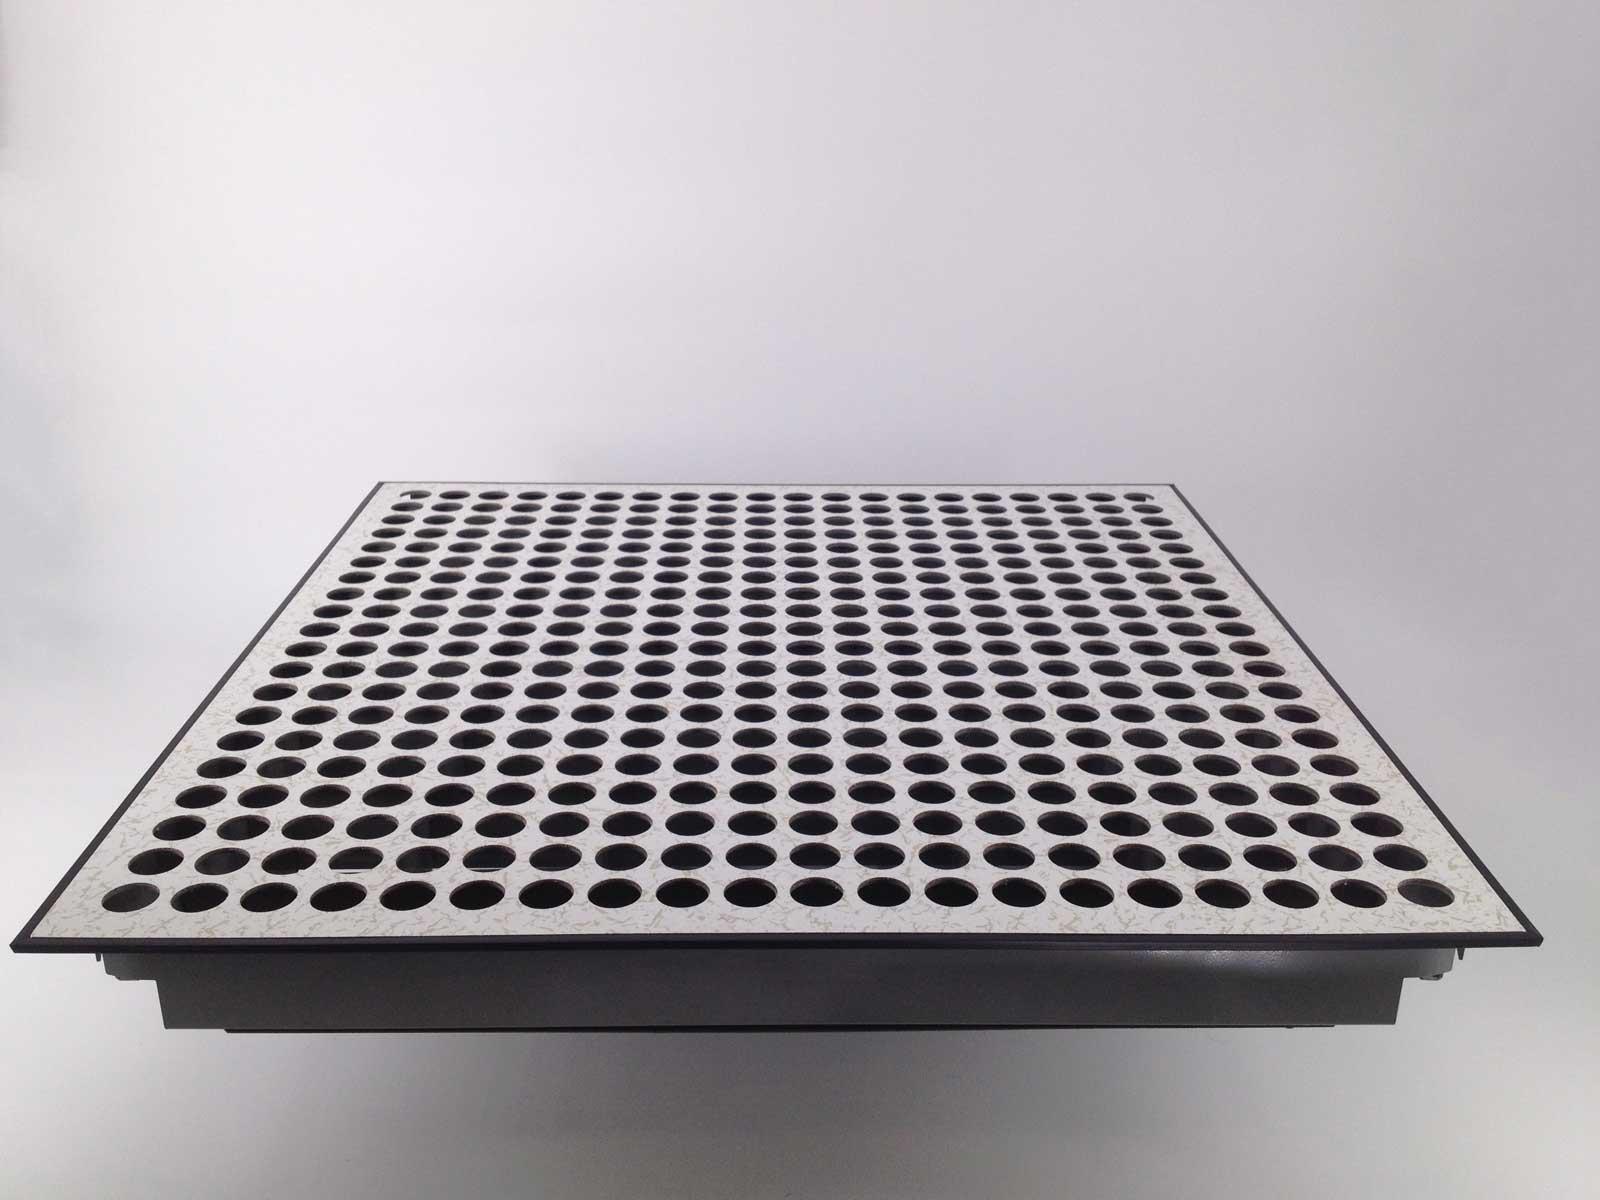 Raised Access Flooring Perforated Hpl Panel